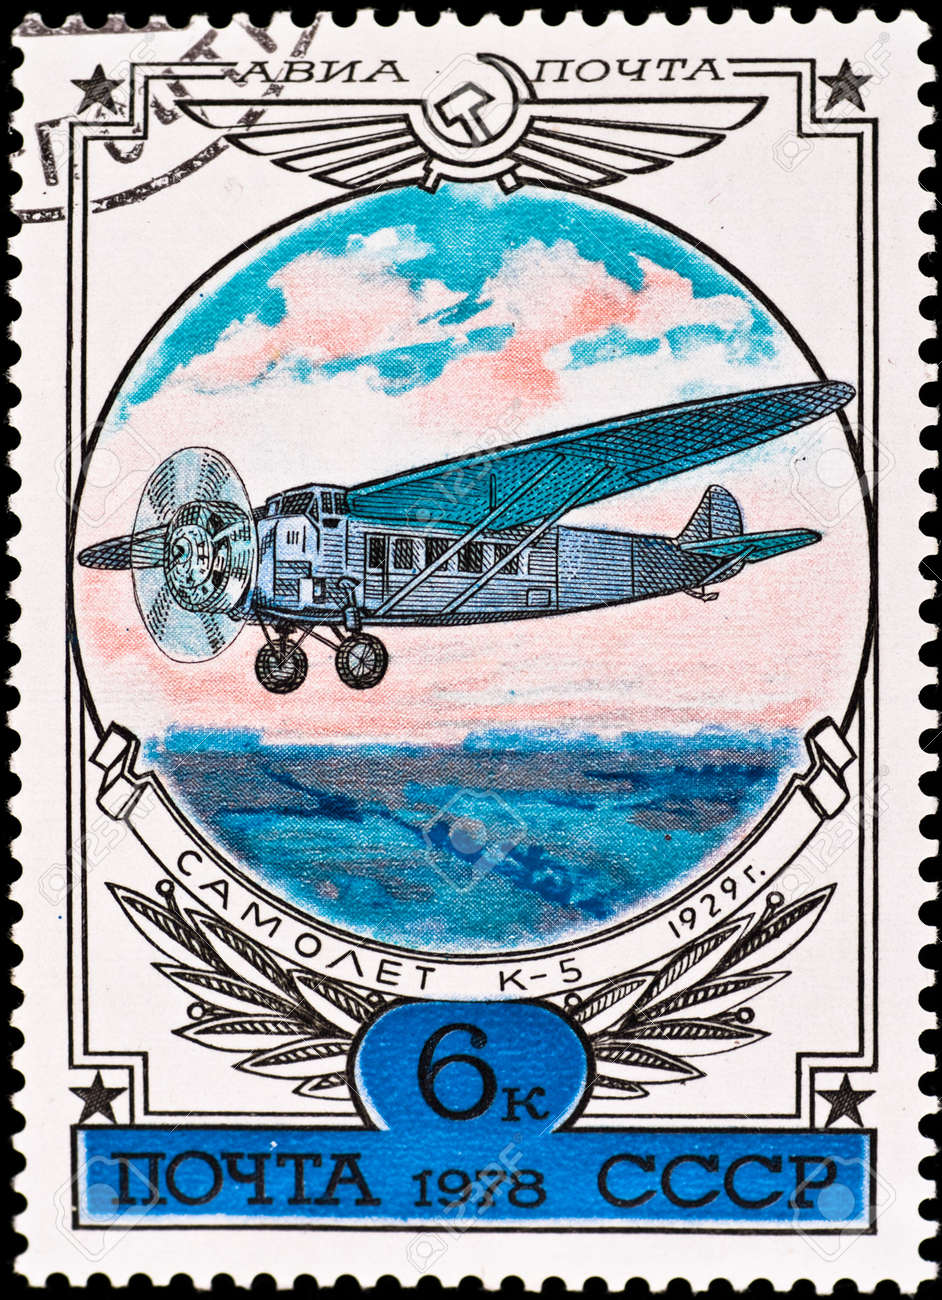 USSR - CIRCA 1978: postage stamp show airplane k-5, circa 1978 Stock Photo - 6218057